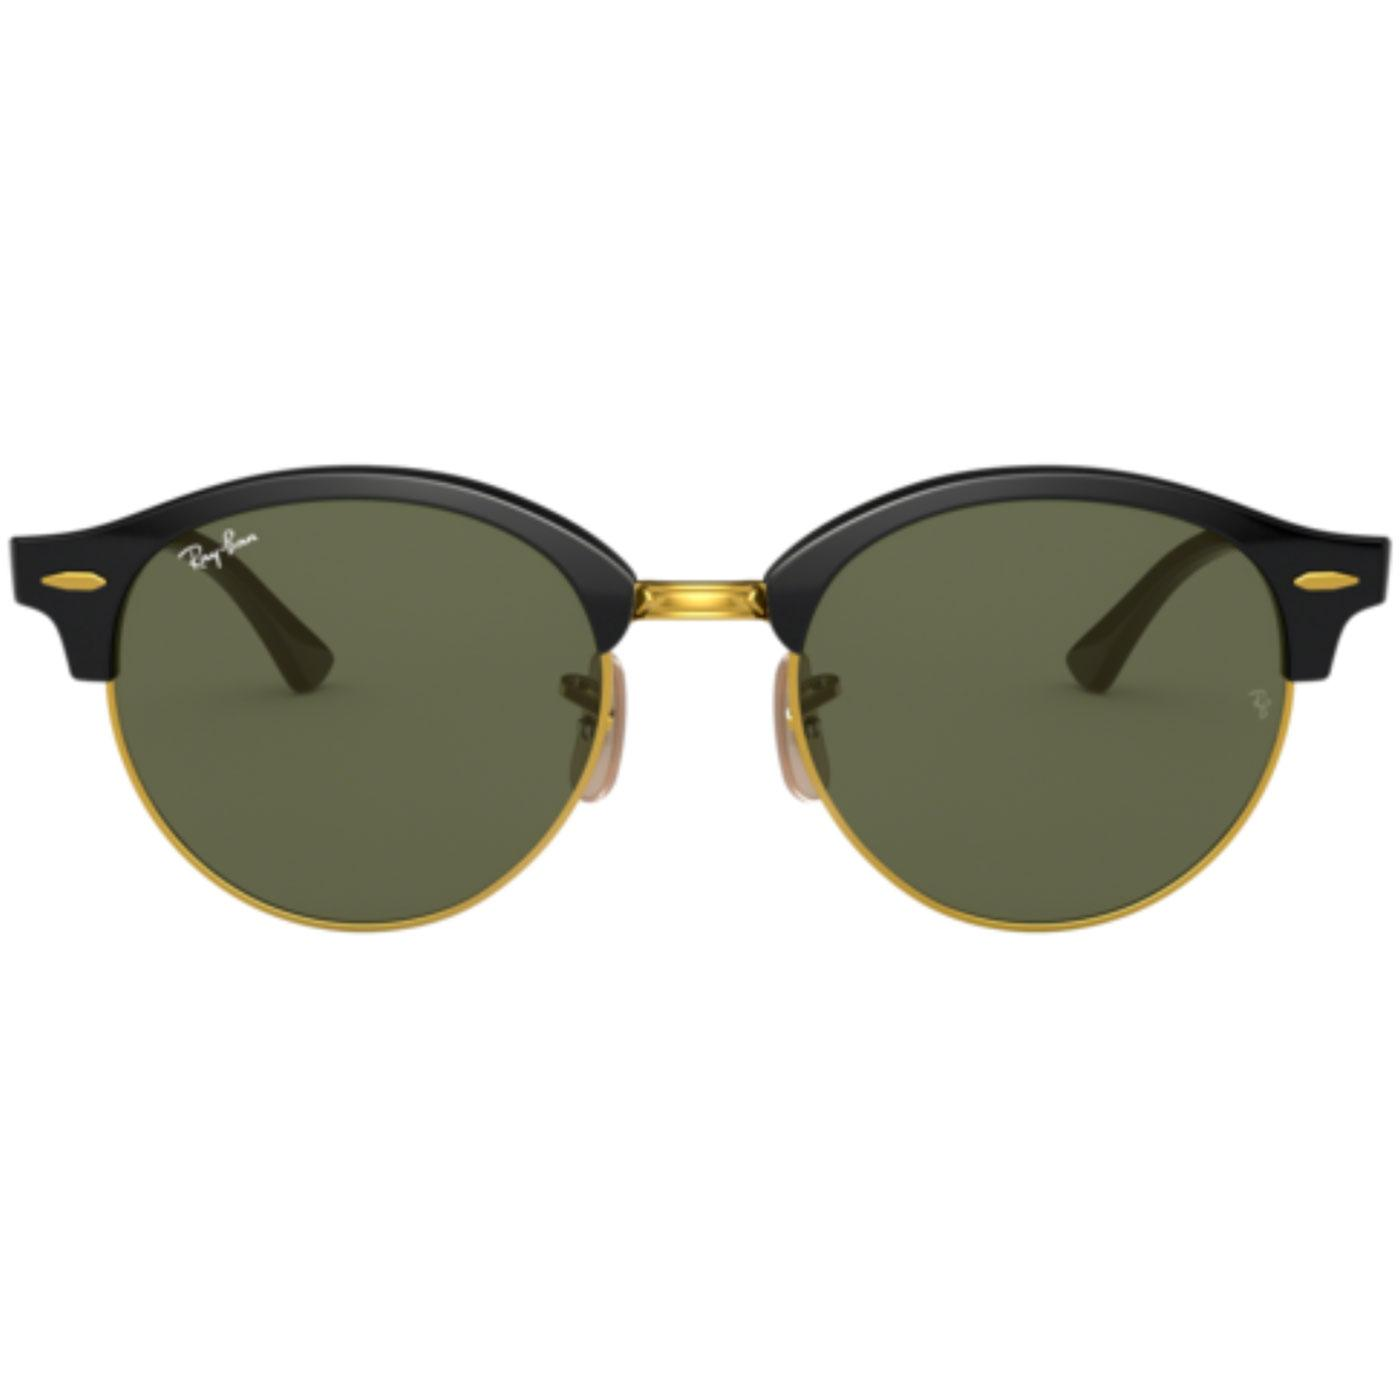 Clubround RAY-BAN Retro Mod Sixties Sunglasses